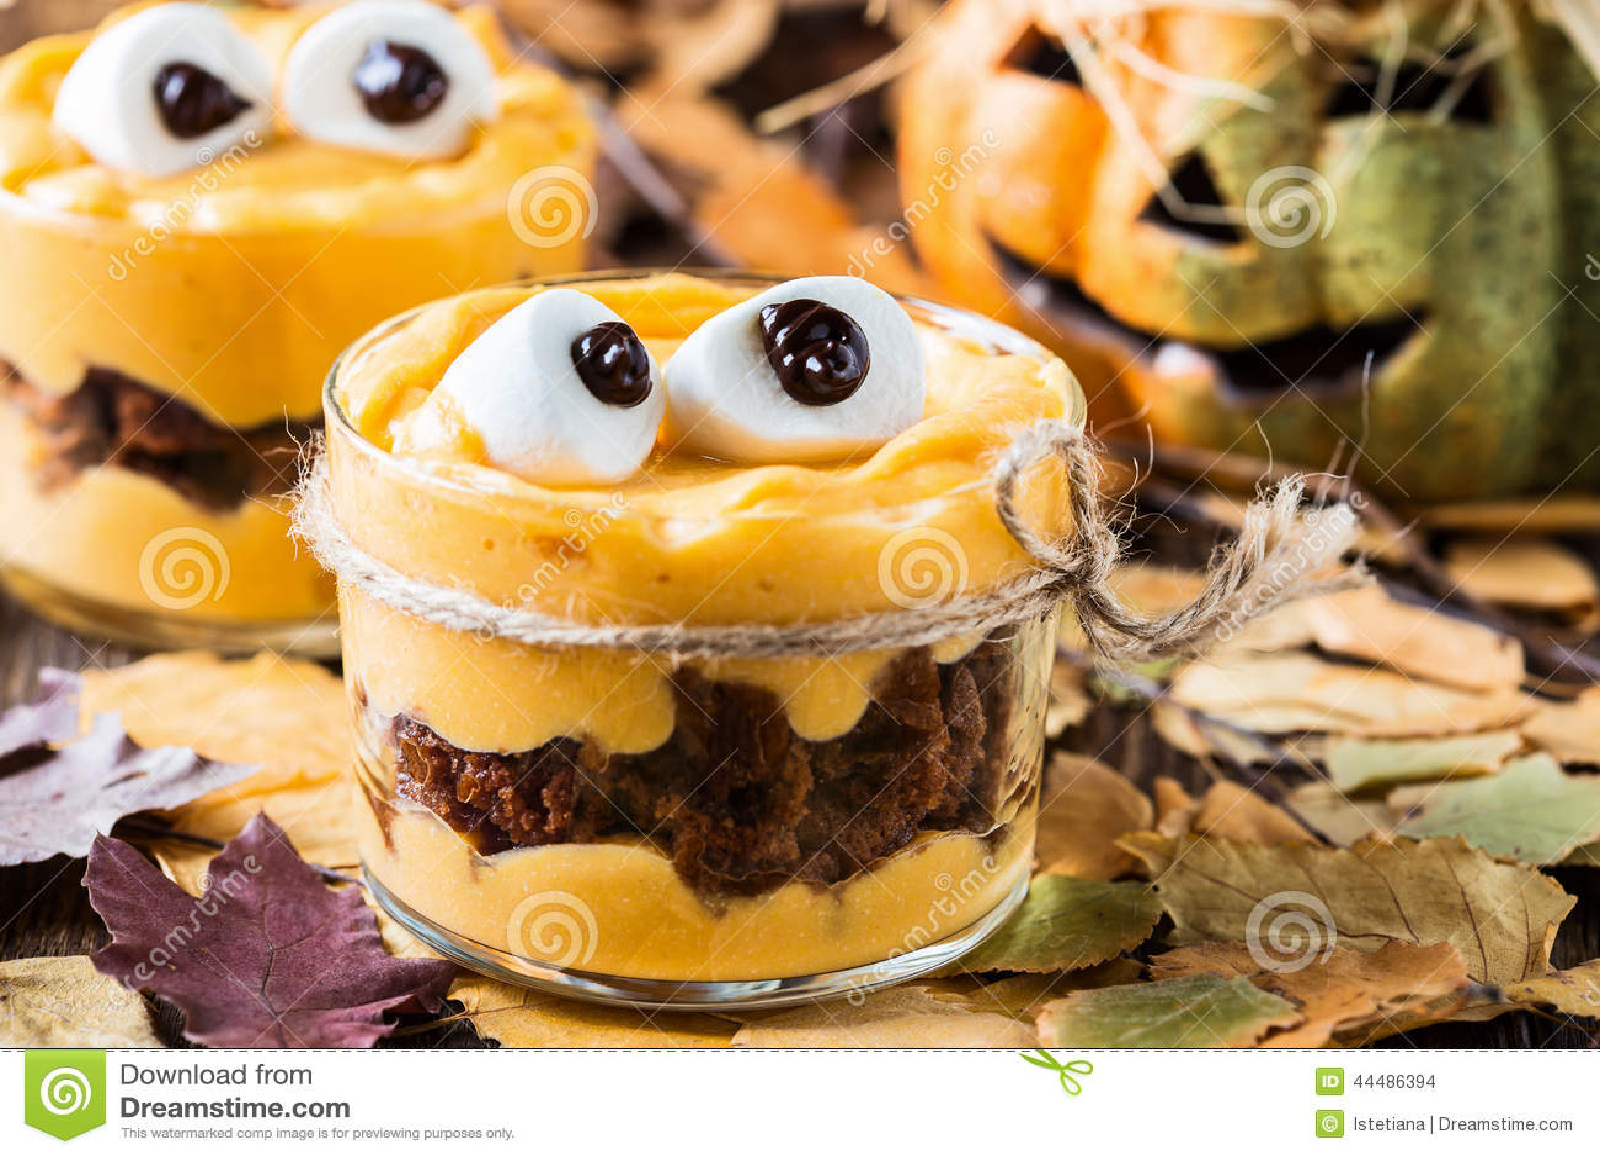 Halloween treats little monster dessert stock photo image 44486394 - Recette dessert halloween ...